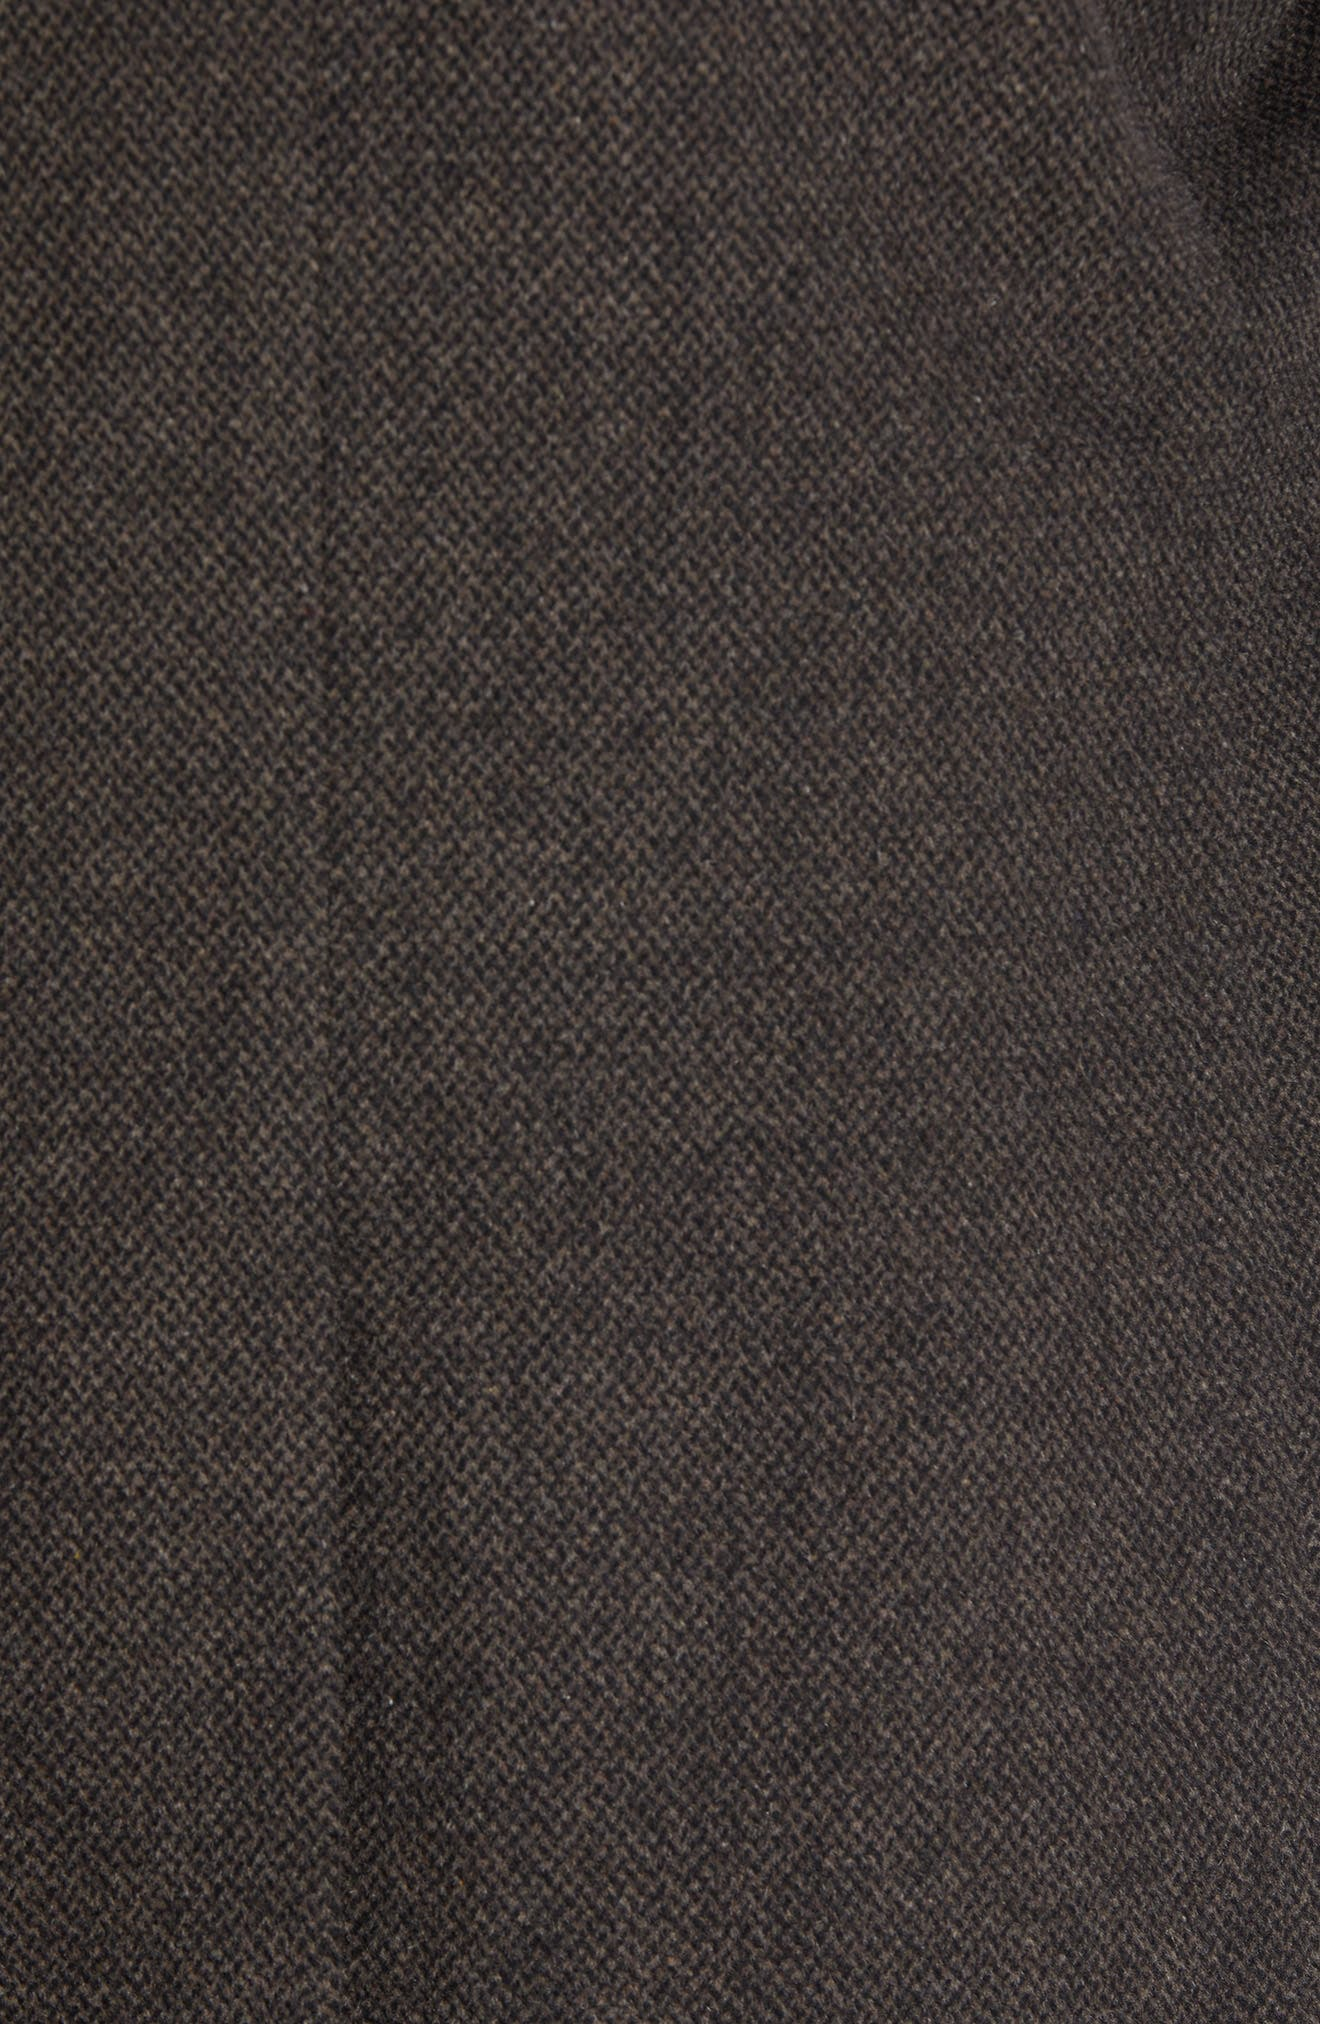 Kingman Modern Fit Wool Blend Coat with Removable Zipper Bib,                             Alternate thumbnail 11, color,